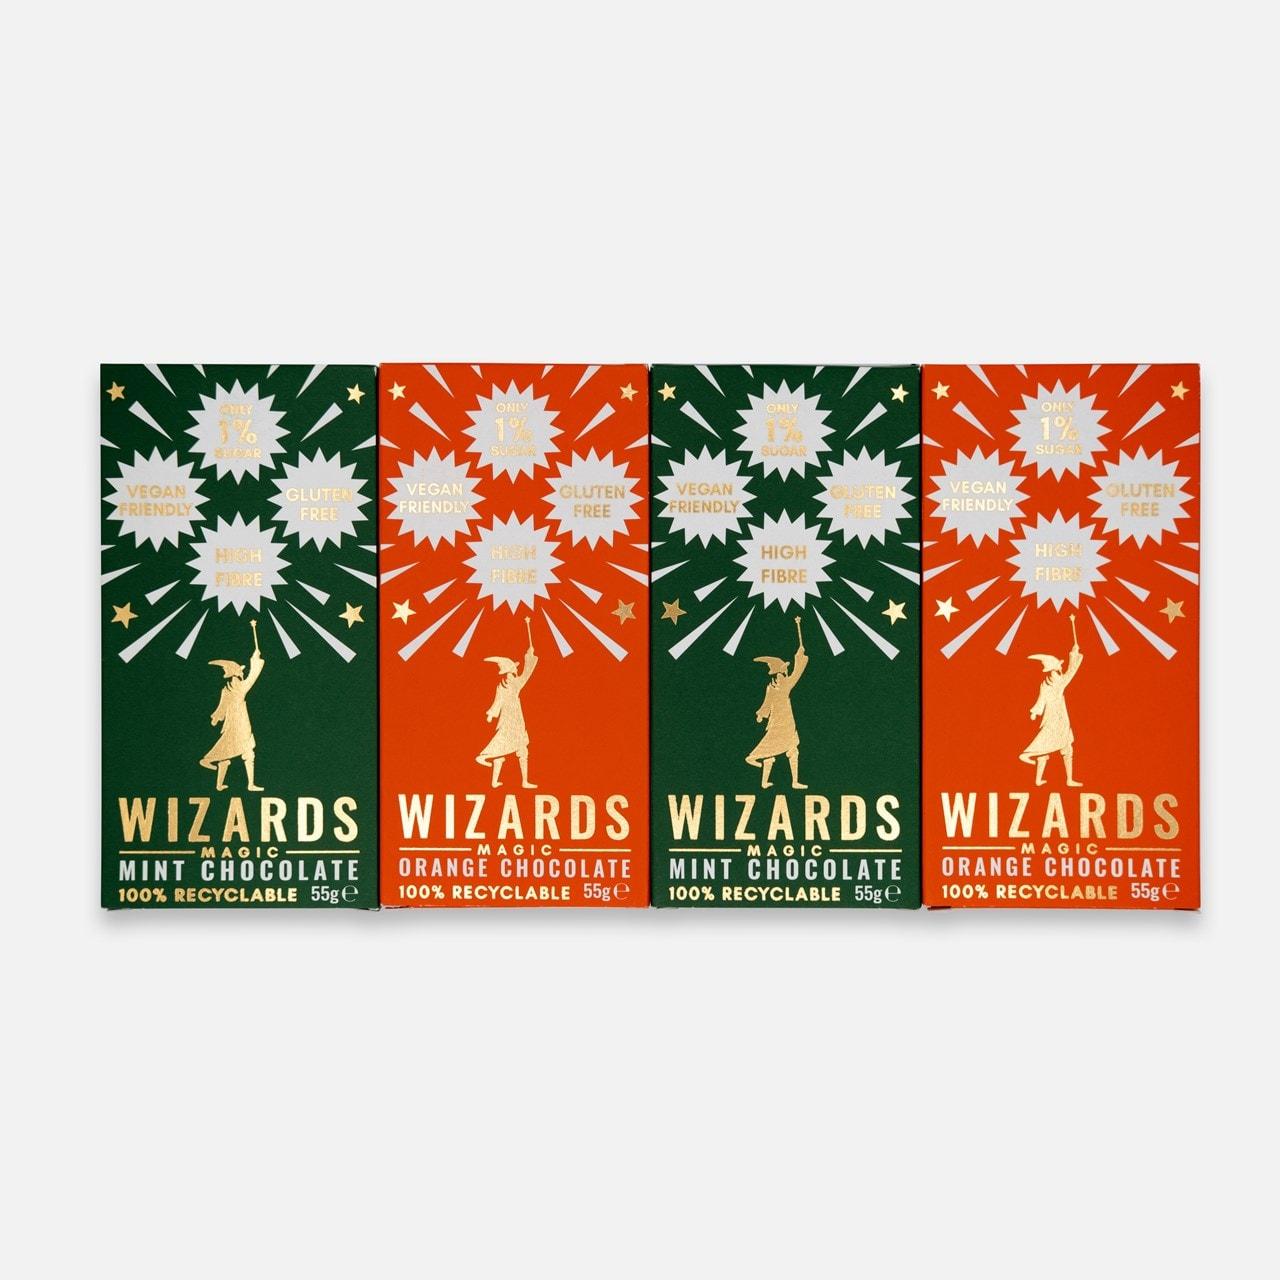 Wizards Magic Chocolate: 1% Sugar Original Gift Pack: Mint & Orange (Pack of 4) - 1